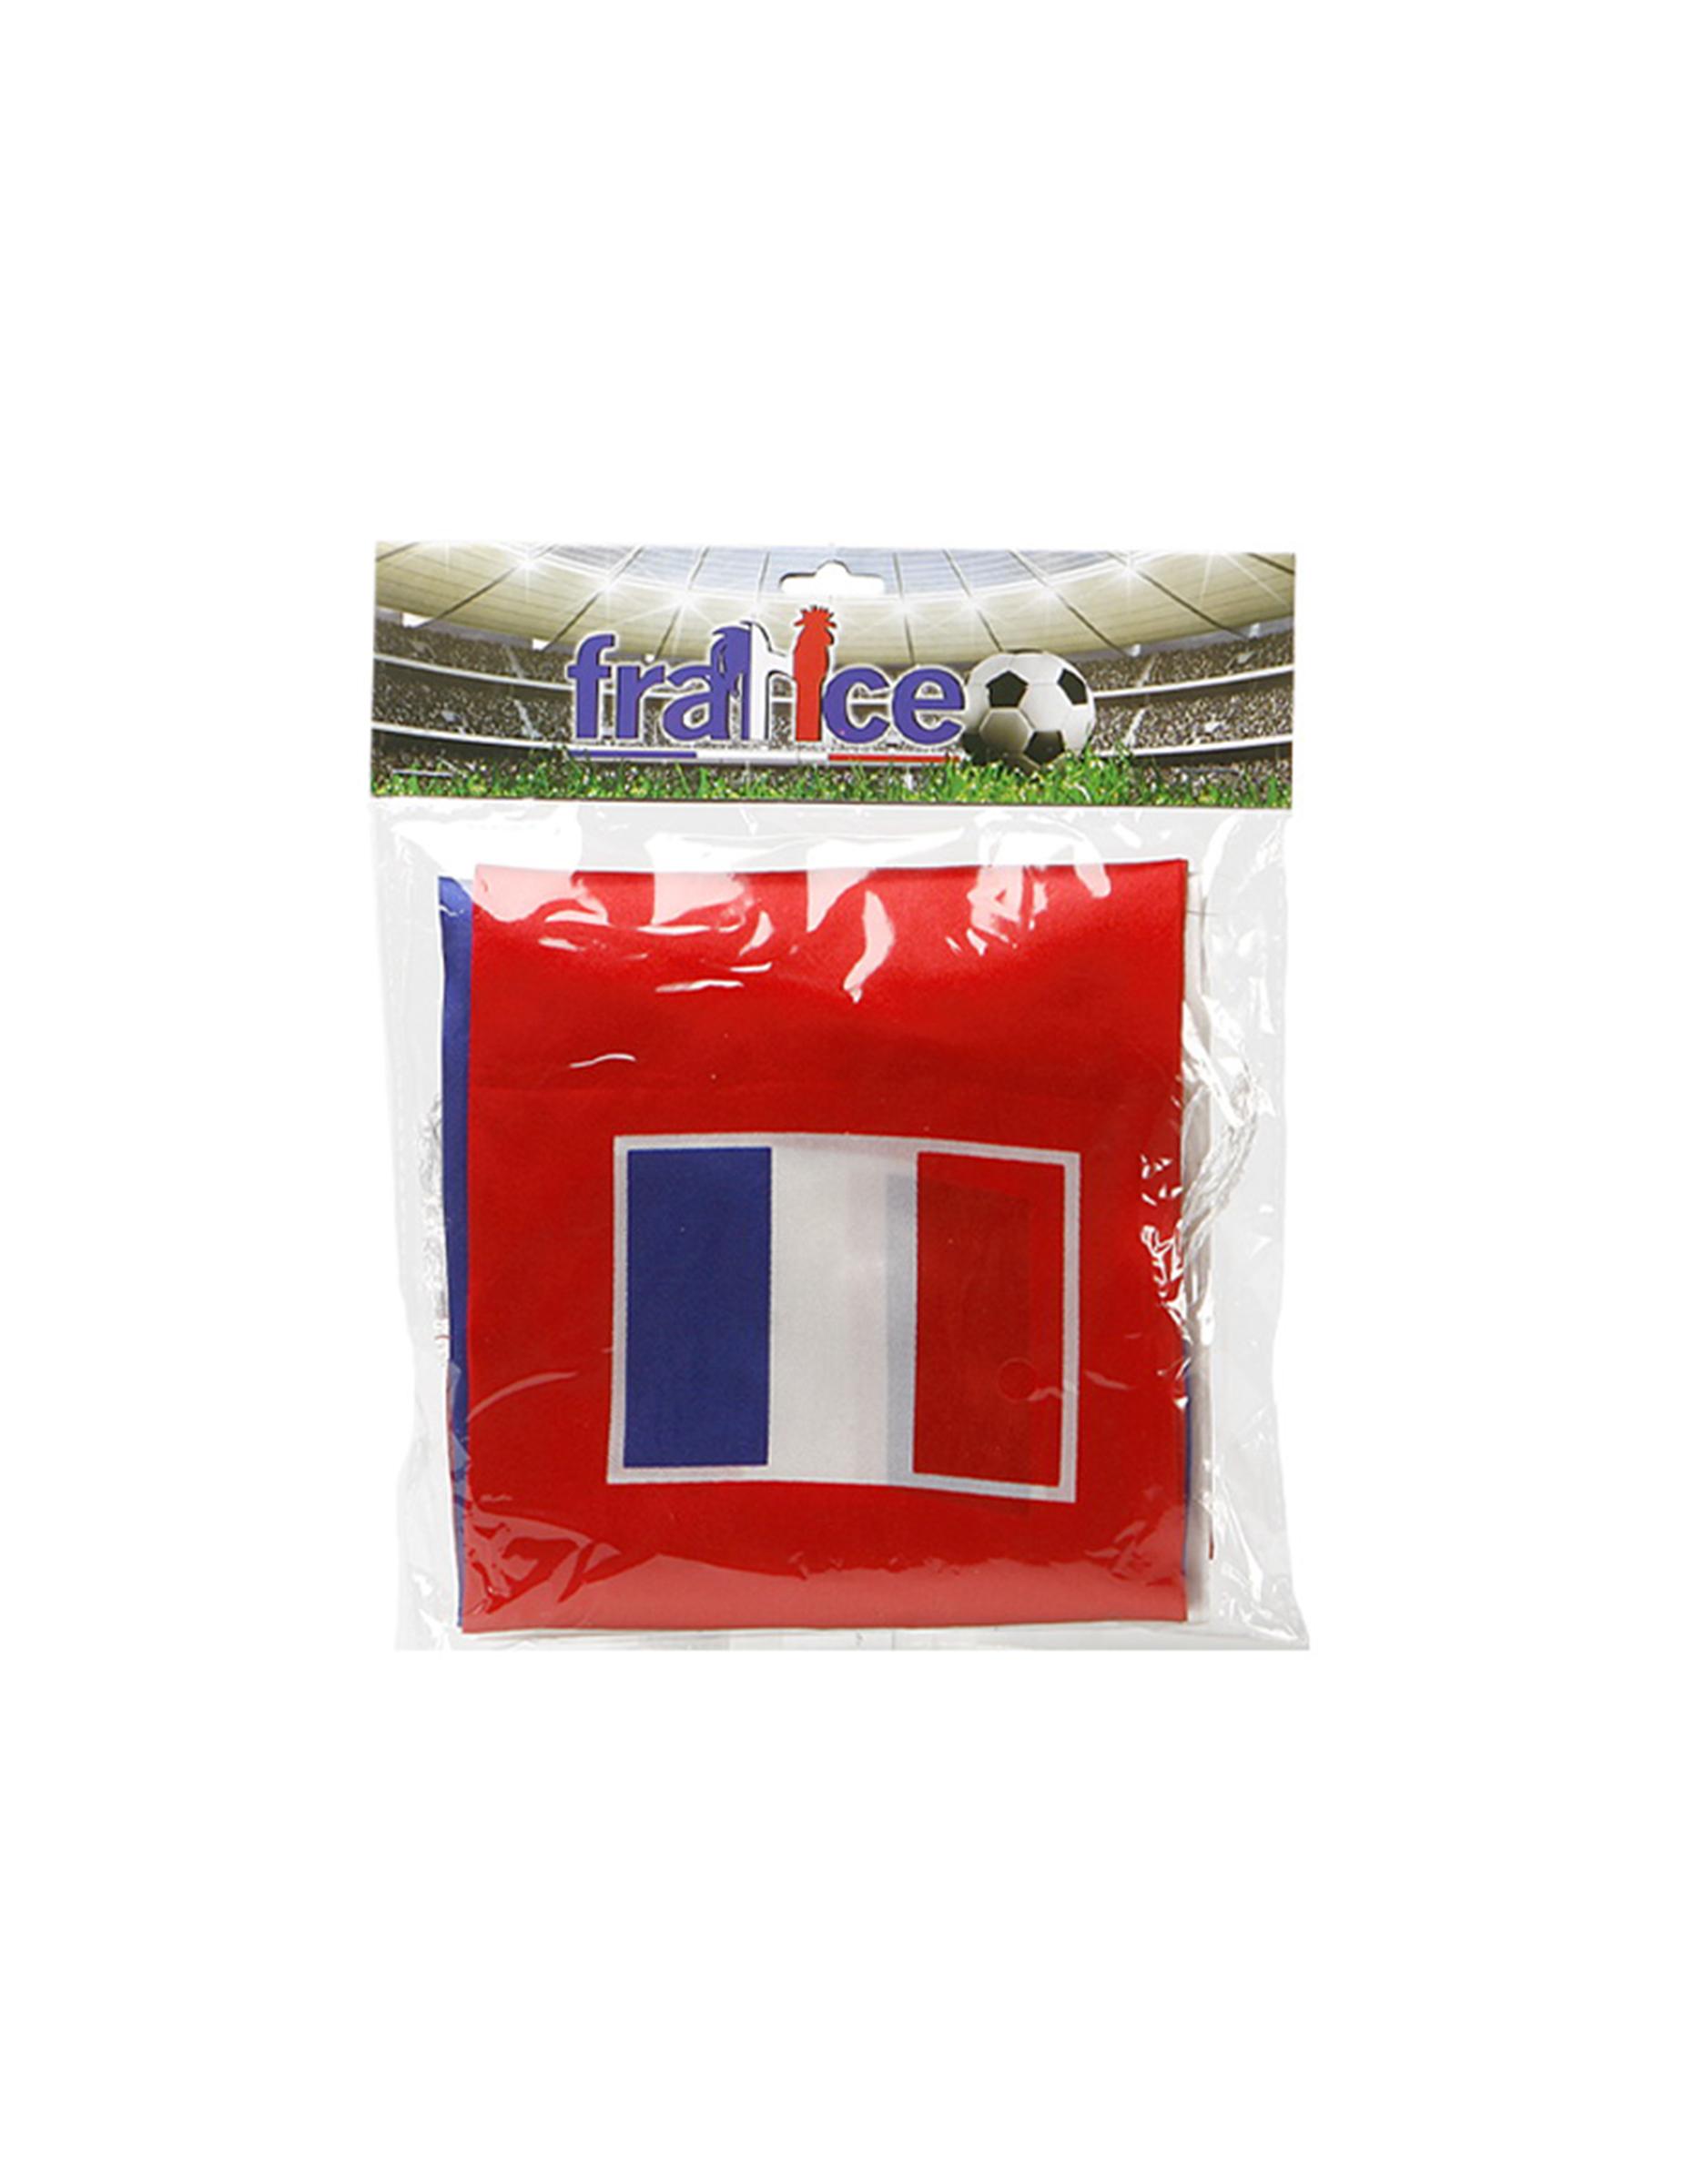 2a56d85899b Echarpe supporter France. Echarpe tricolore pour Supporter